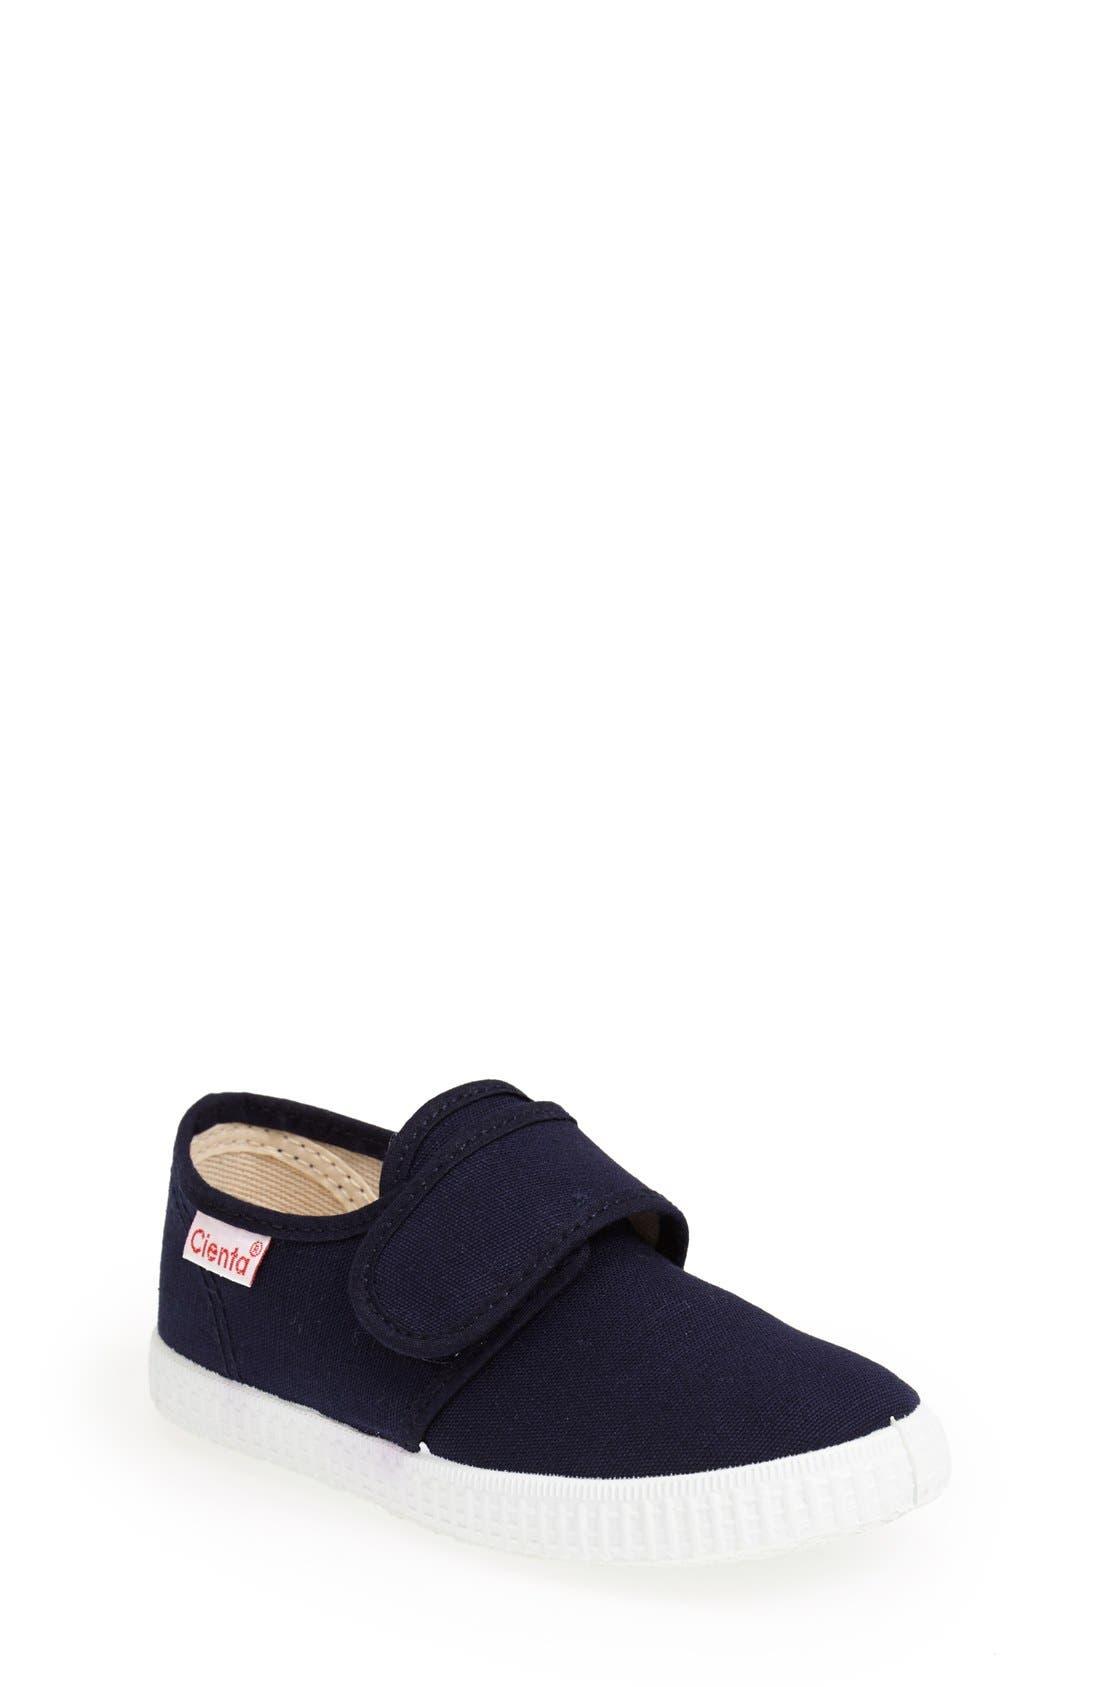 Canvas Sneaker,                             Main thumbnail 1, color,                             Navy